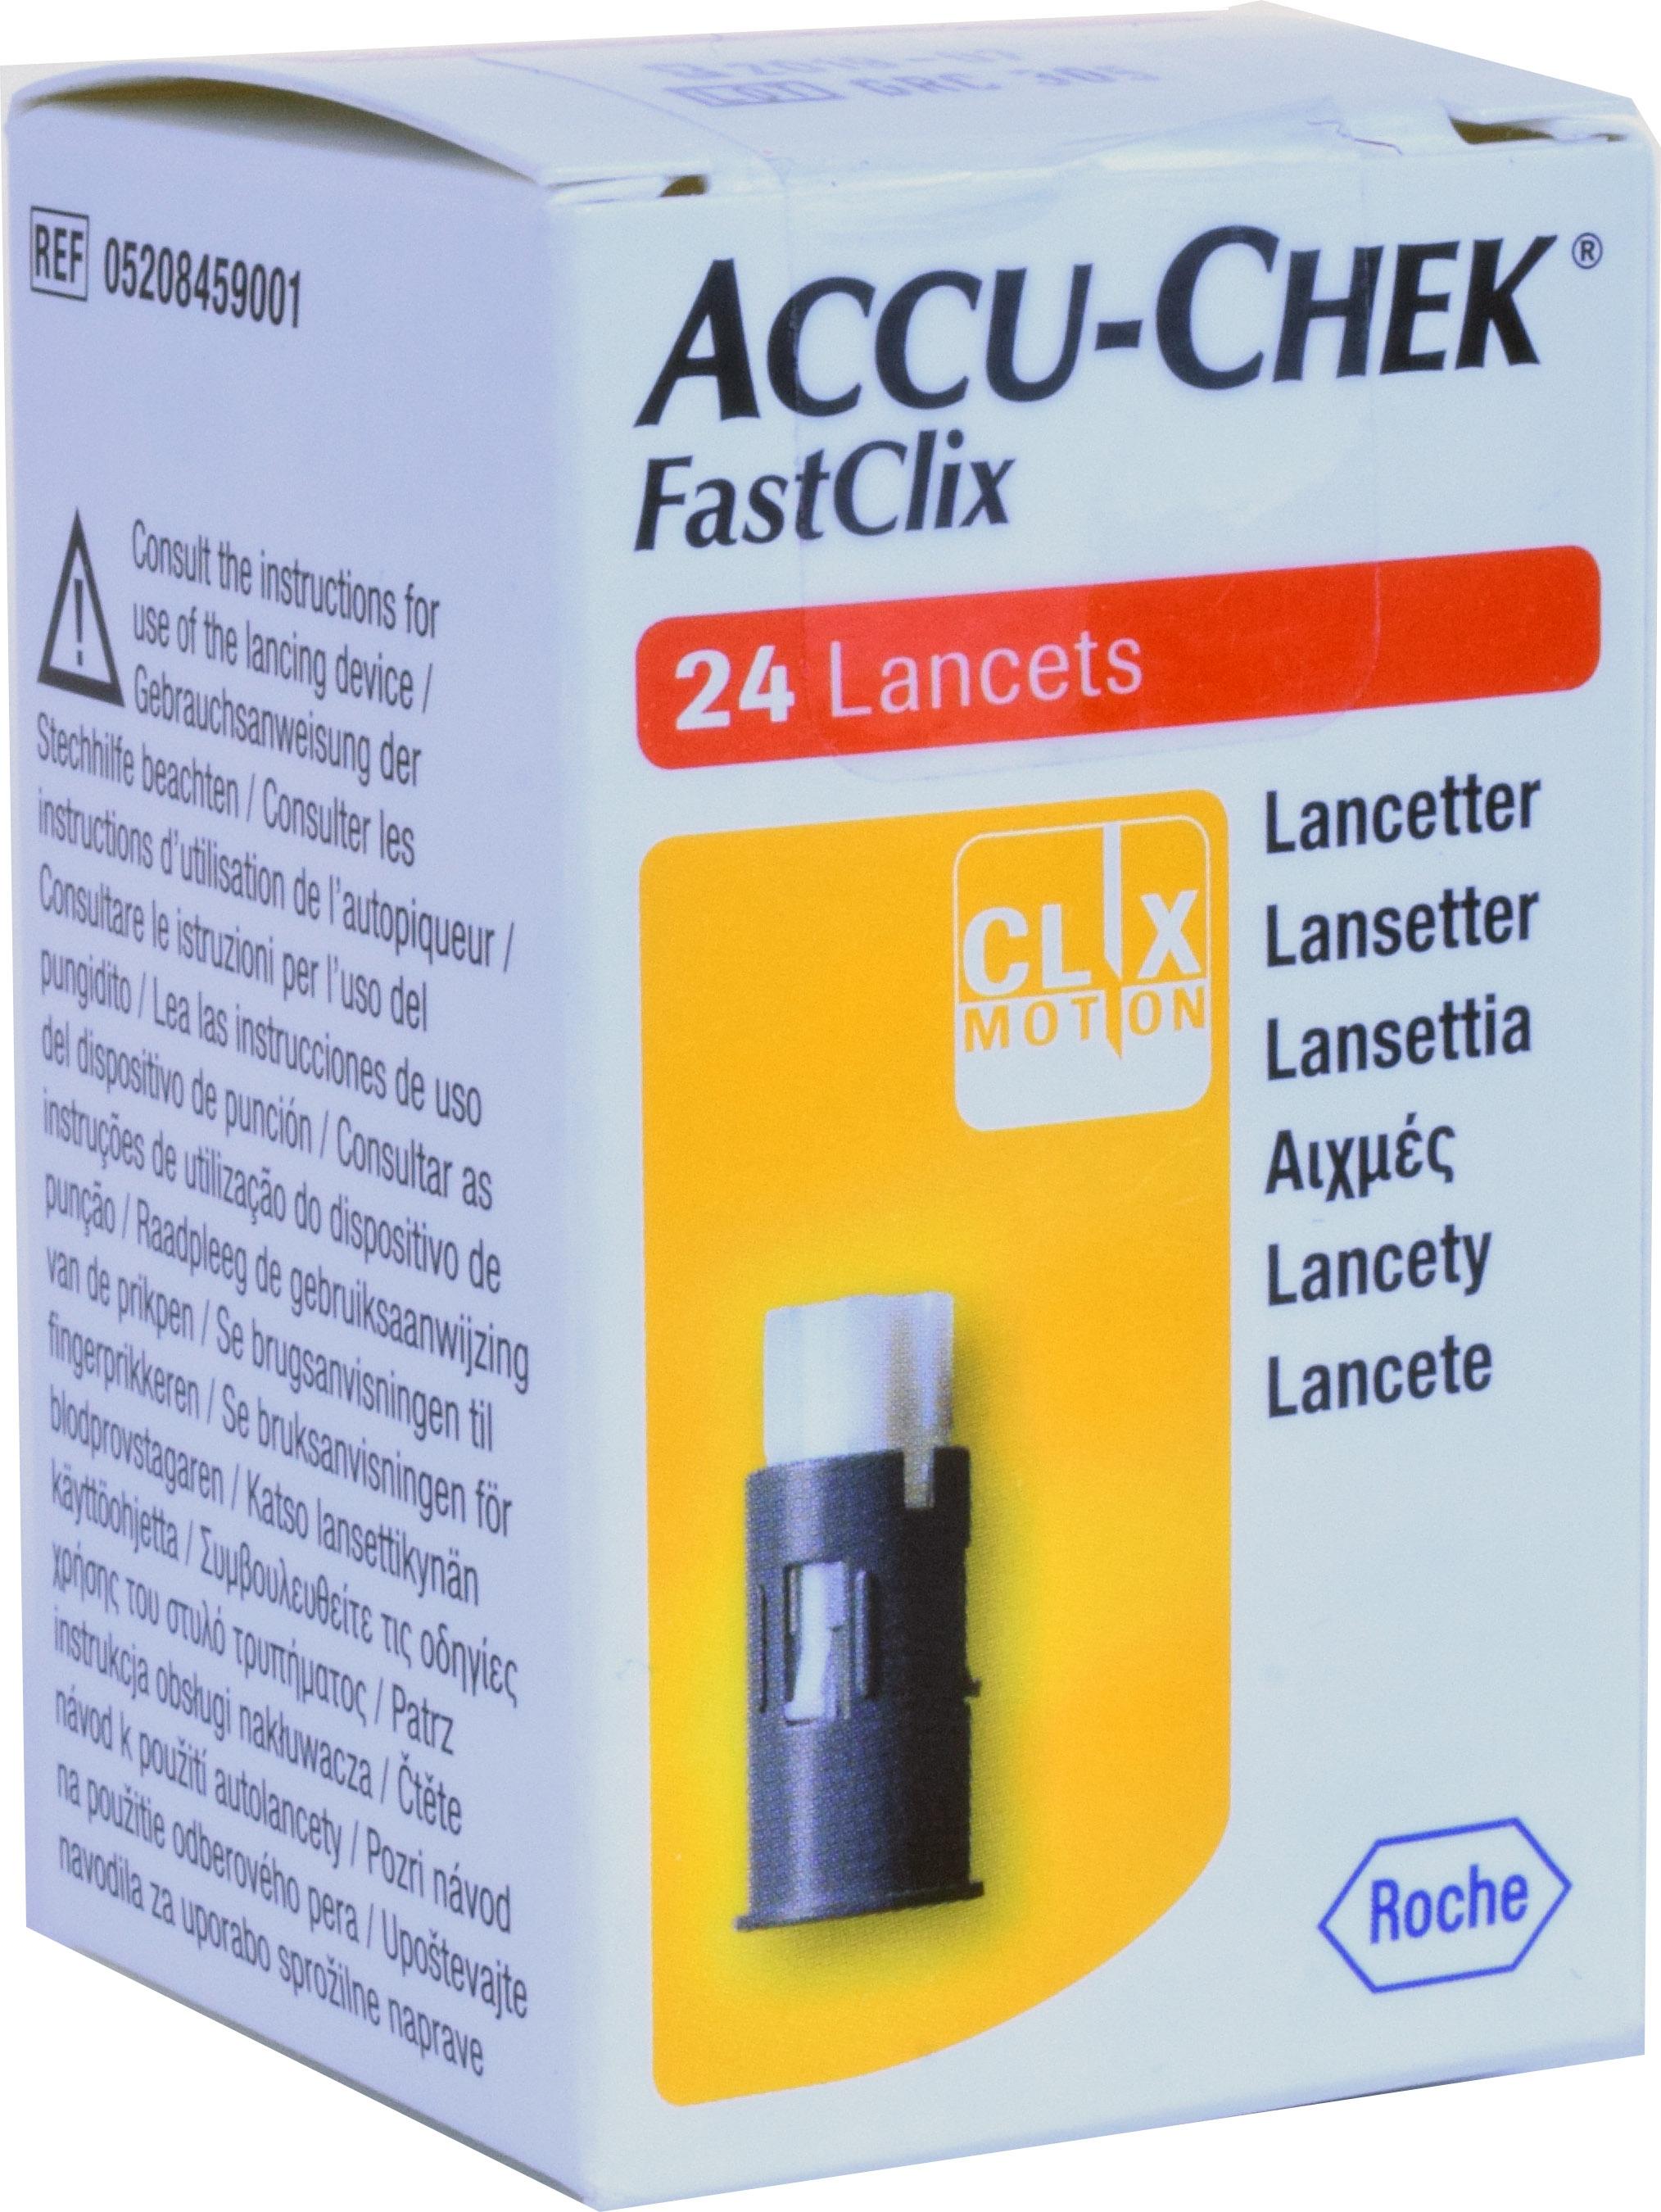 accu-chek-fastclix-24lanc